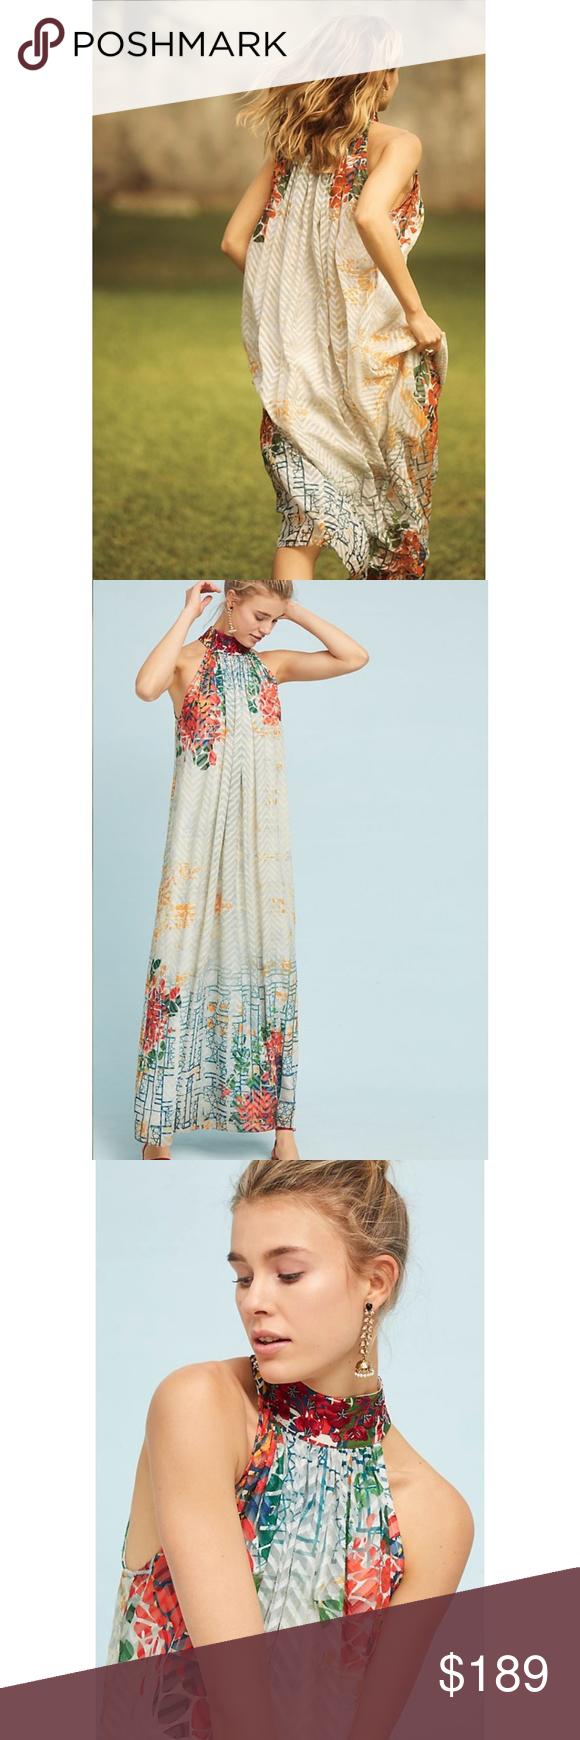 348d6d1a1475 NWT ANTHROPOLOGIE Bhanuni Jyoti Marilla Maxi Dress RARE HTF Brand new with tags  NWT ANTHROPOLOGIE Bhanuni